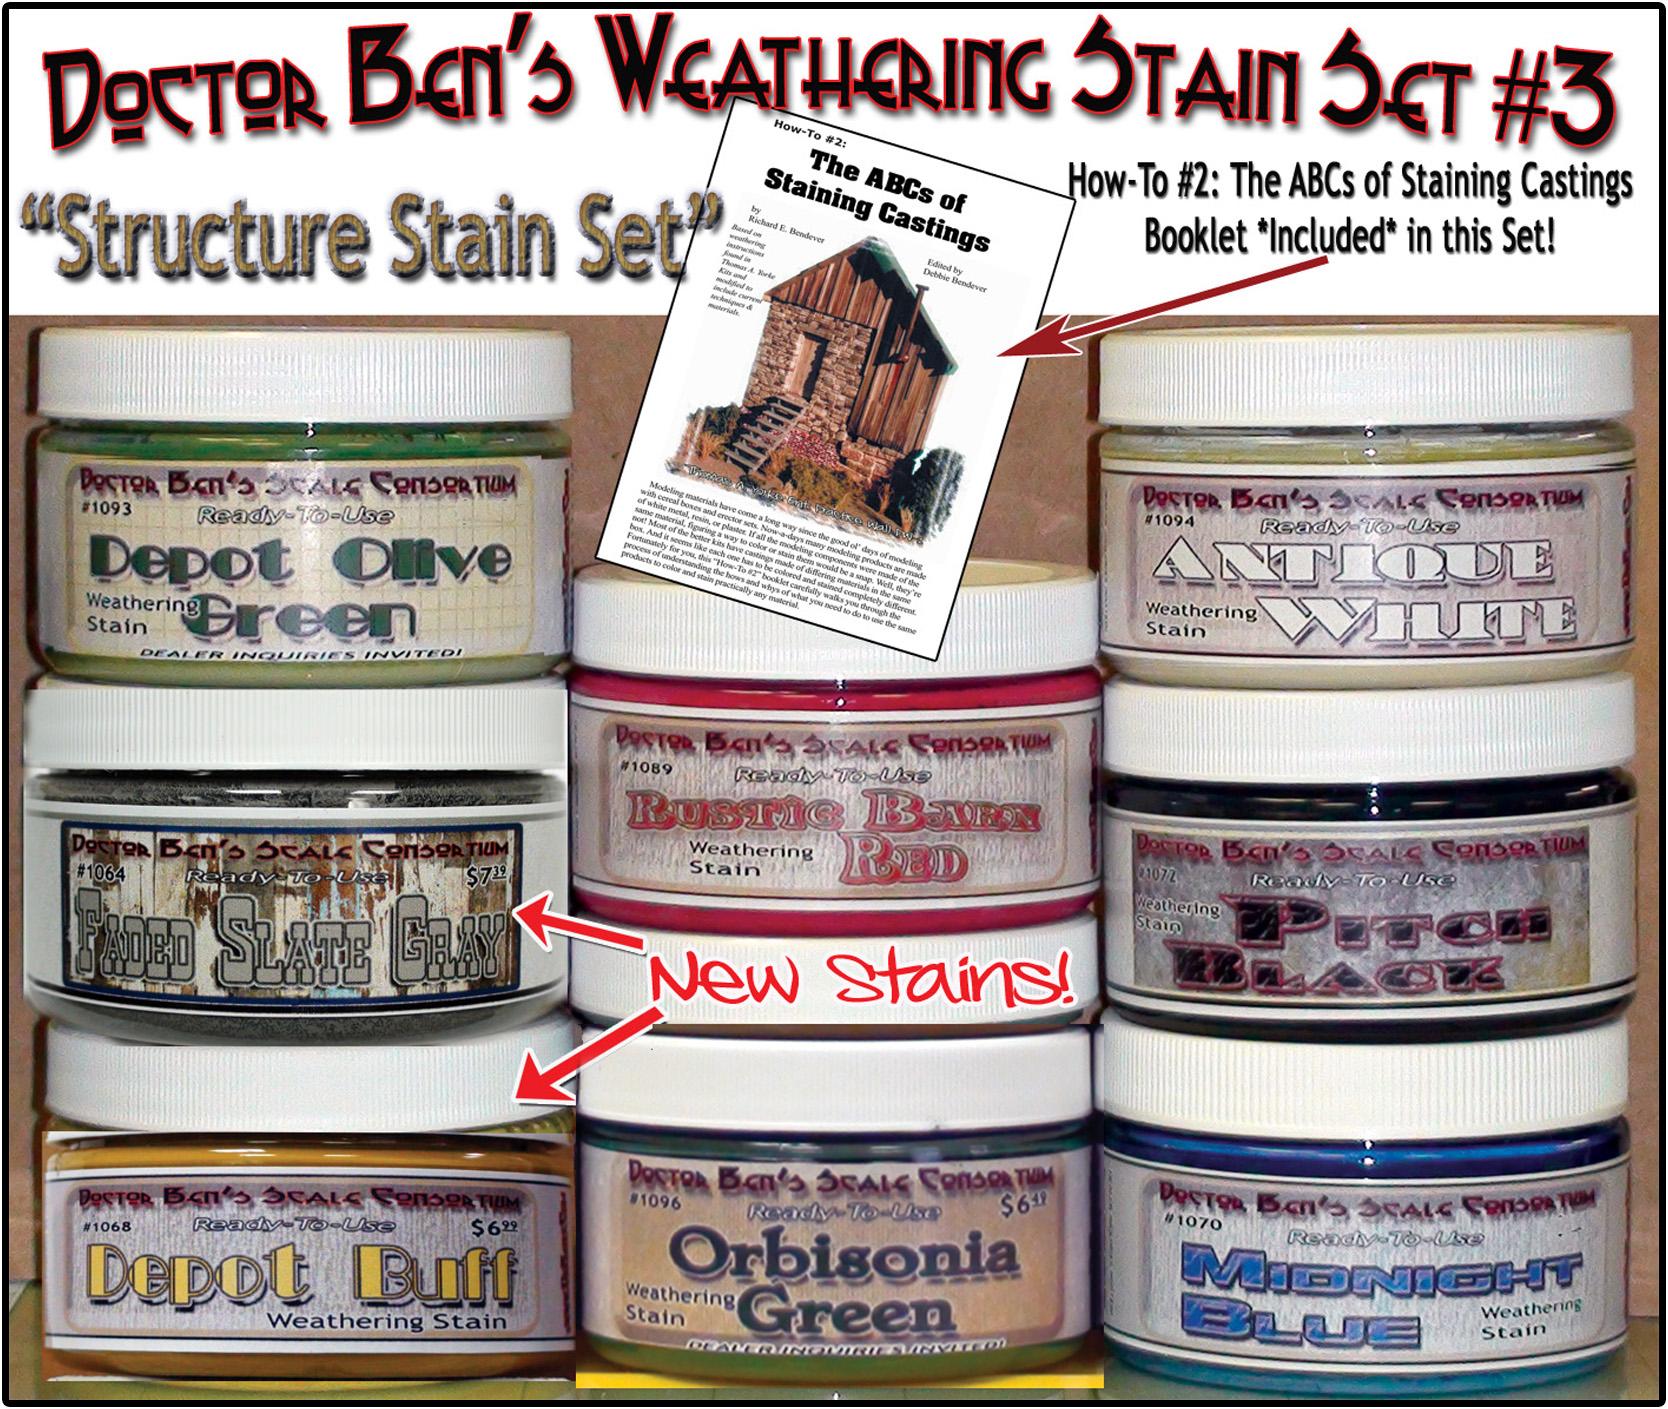 DBZ1097 - Doctor Ben's Weathering Stain